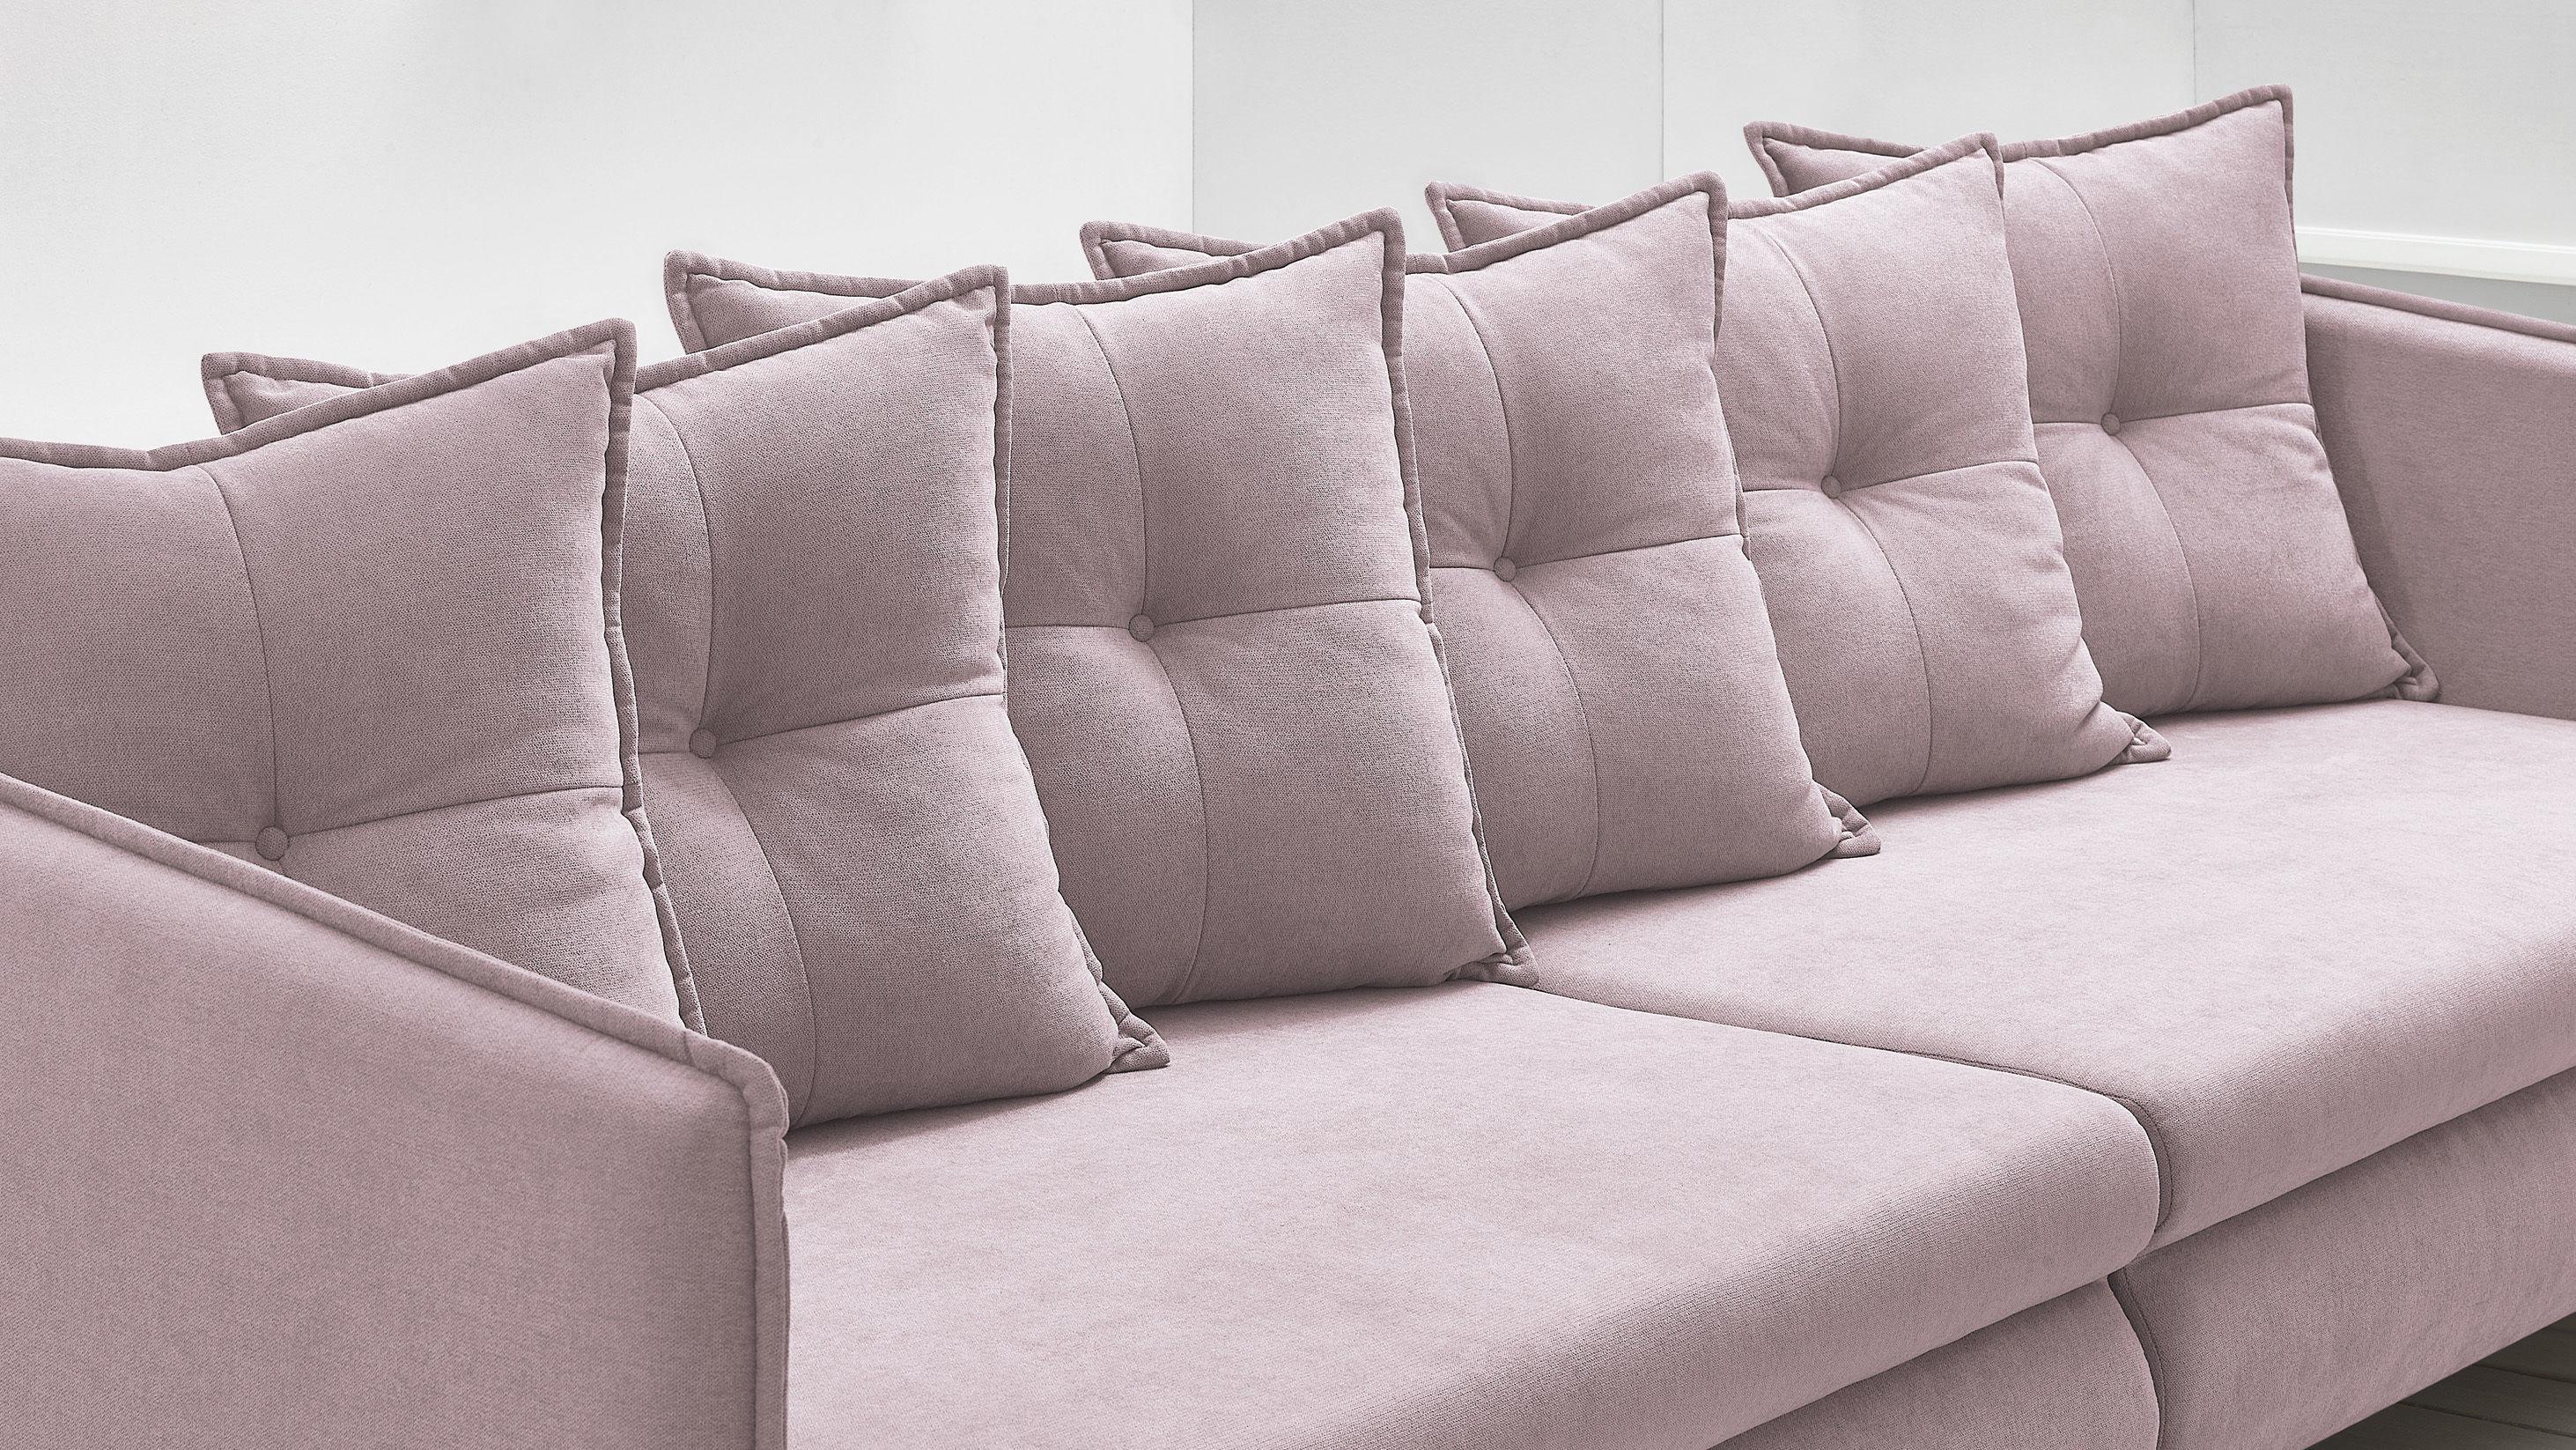 bobochic canap opti sofa 4 places convertible rose poudr achat vente canap s pas. Black Bedroom Furniture Sets. Home Design Ideas